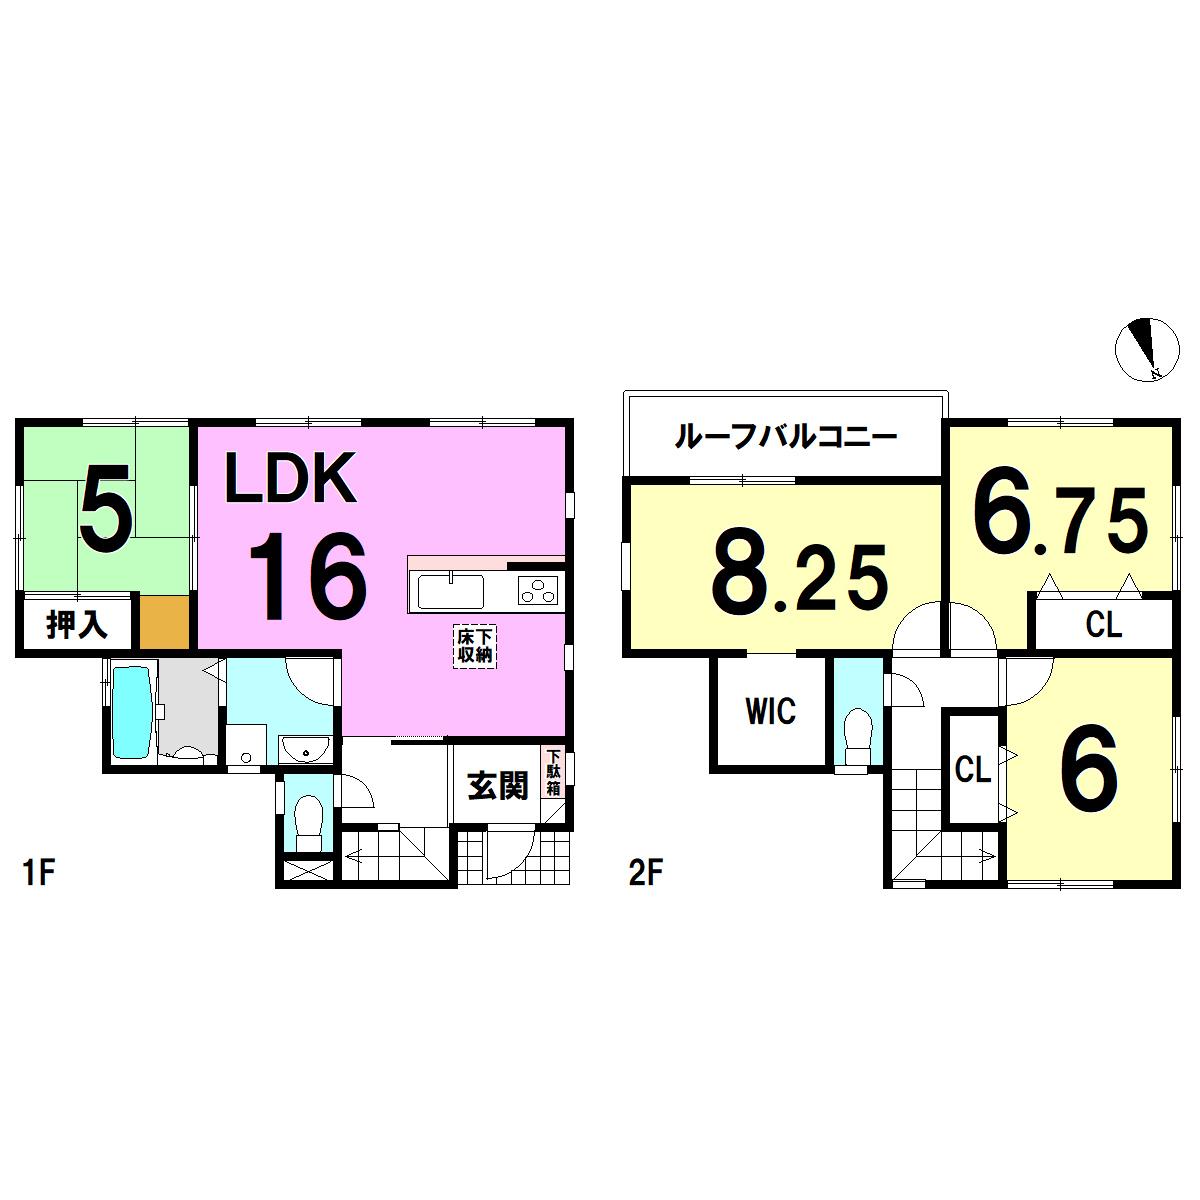 【間取り】 1F:16LDK 5和 2F:8.25洋 6.75洋 6洋 WIC トイレ